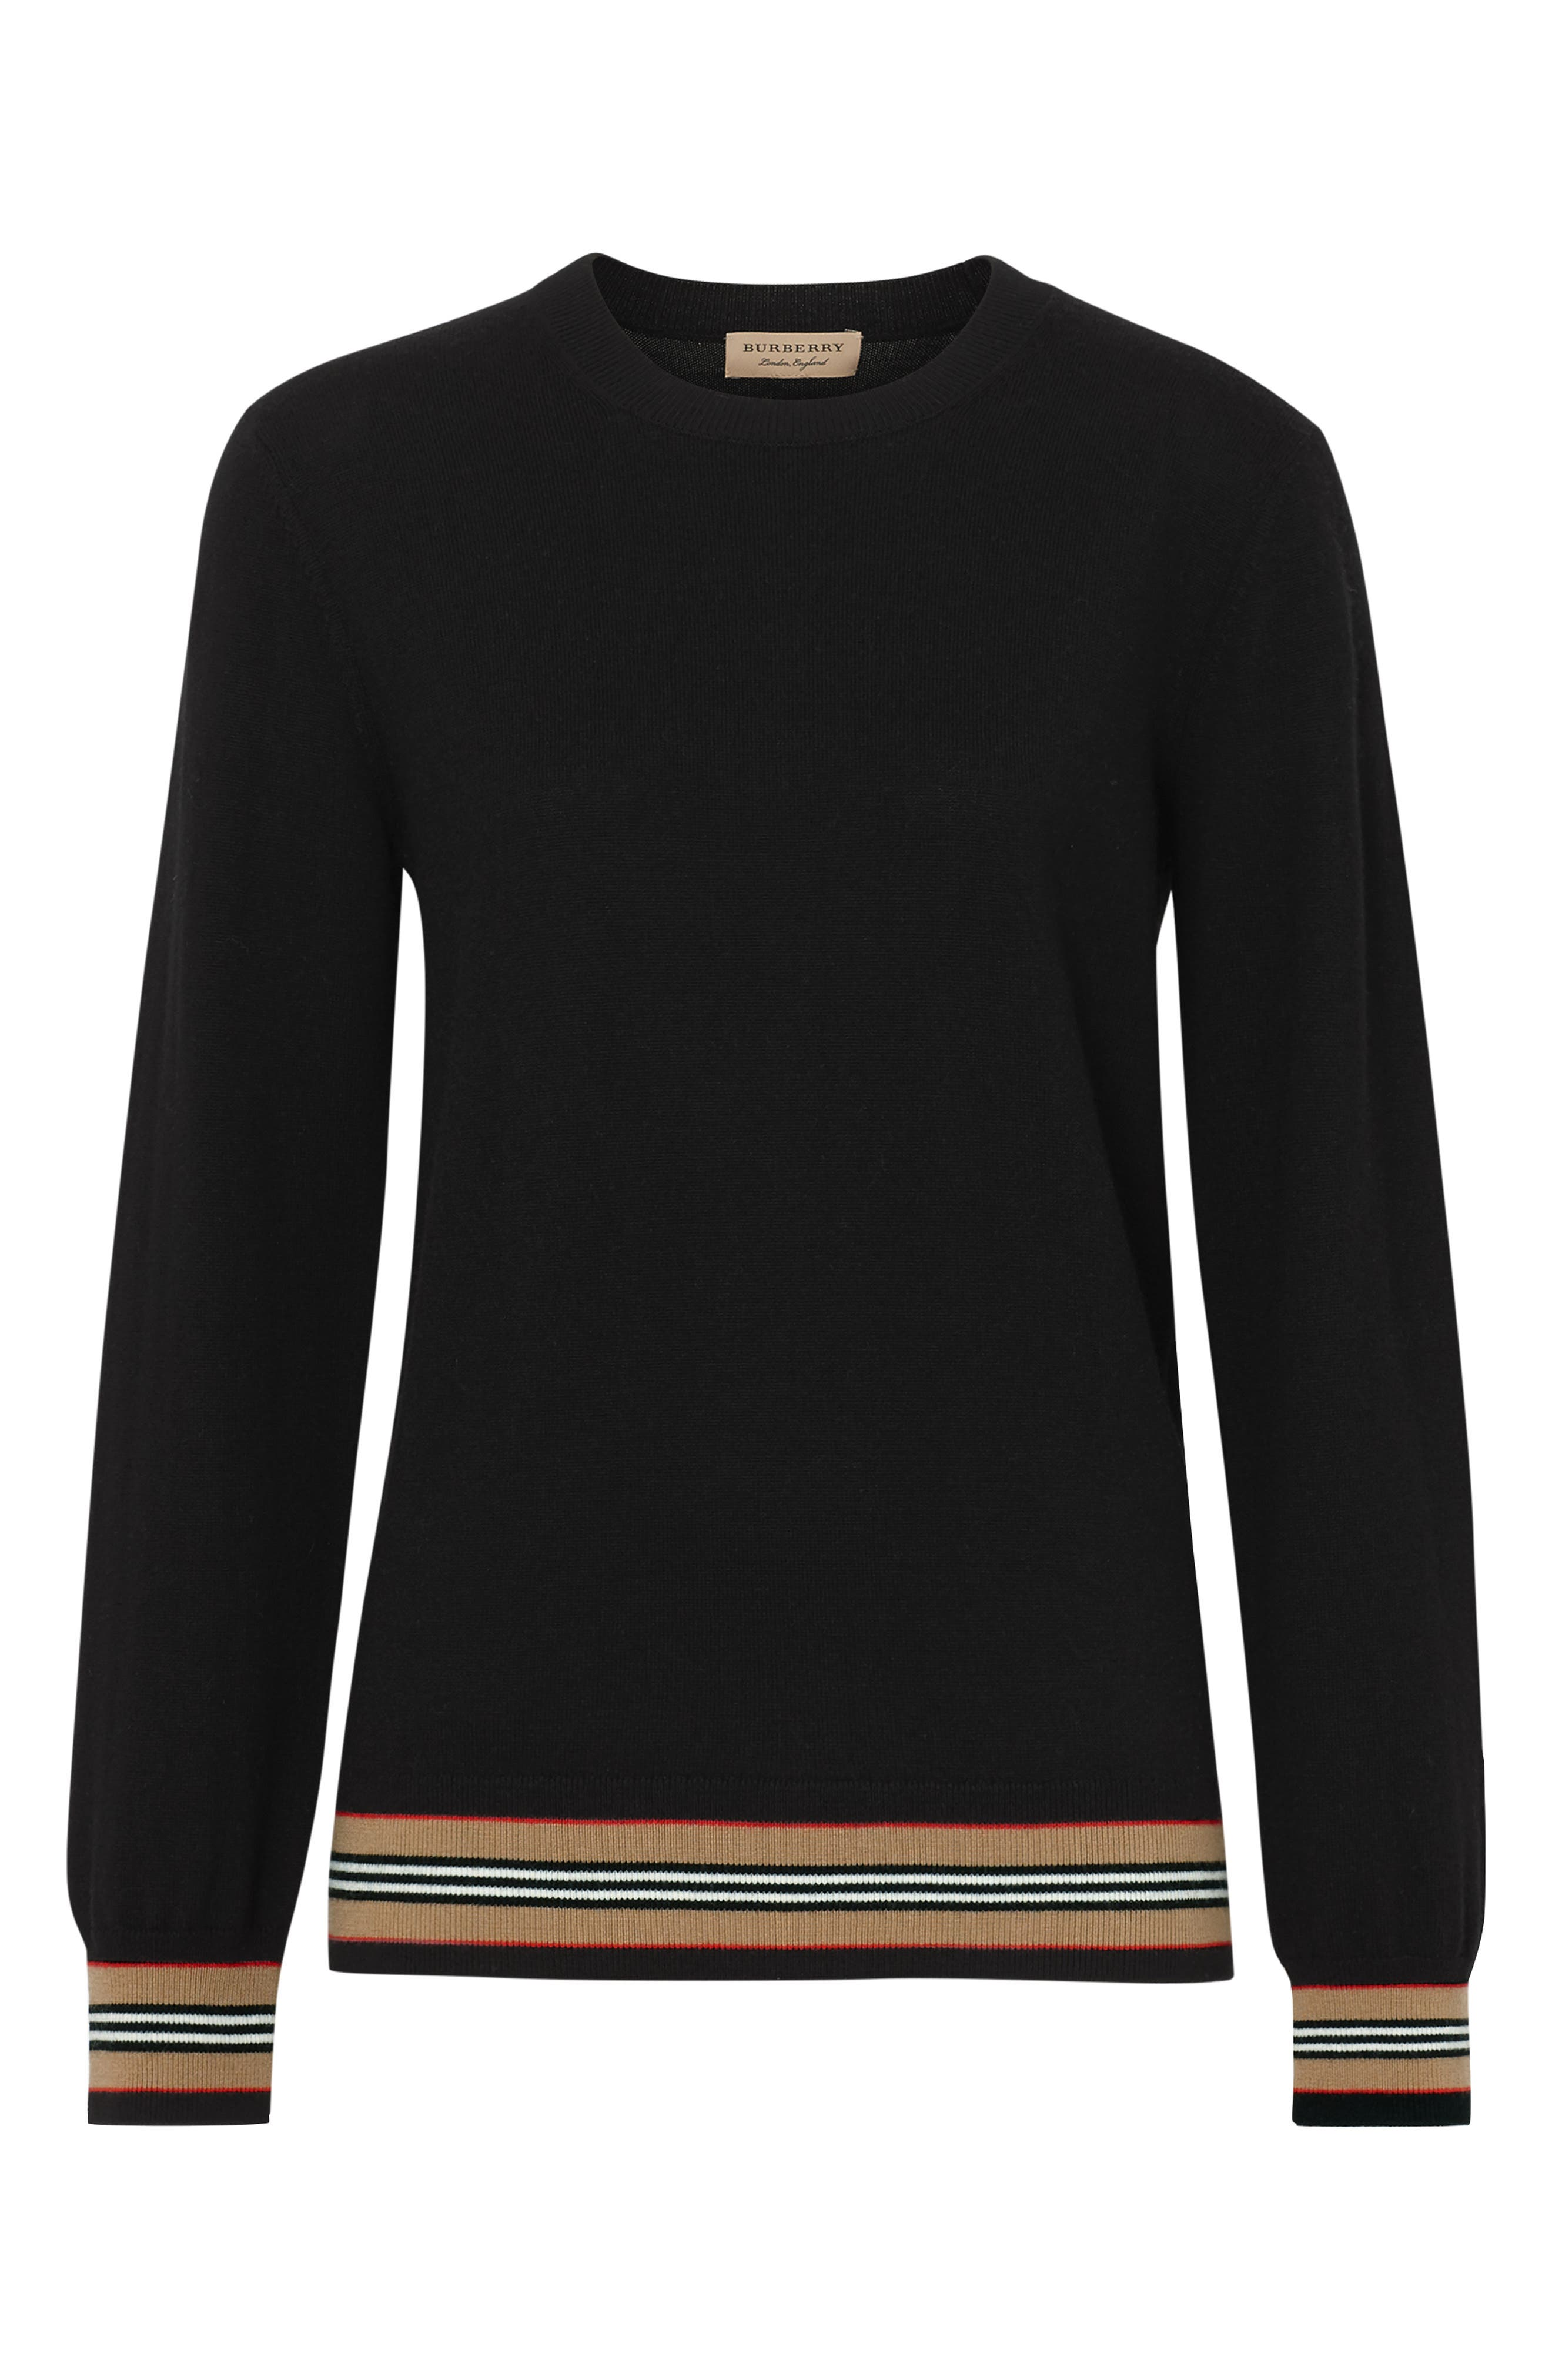 BURBERRY, Stripe Trim Merino Wool Sweater, Alternate thumbnail 4, color, BLACK